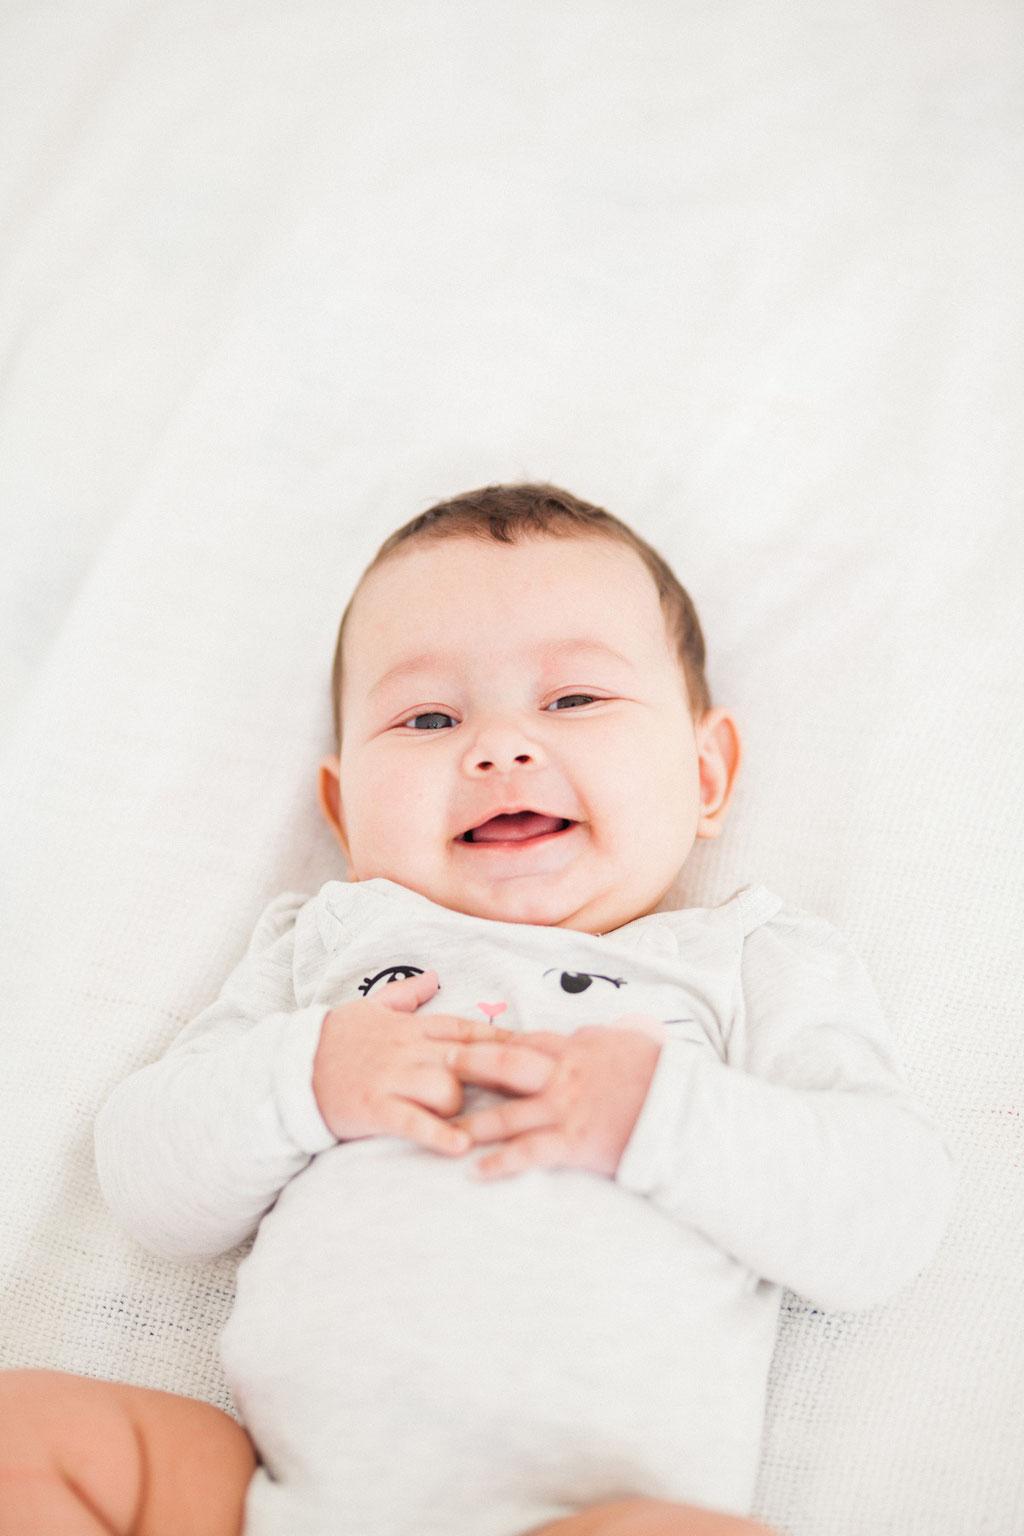 Séance naissance - photographe famille nantes Orlane Boisard